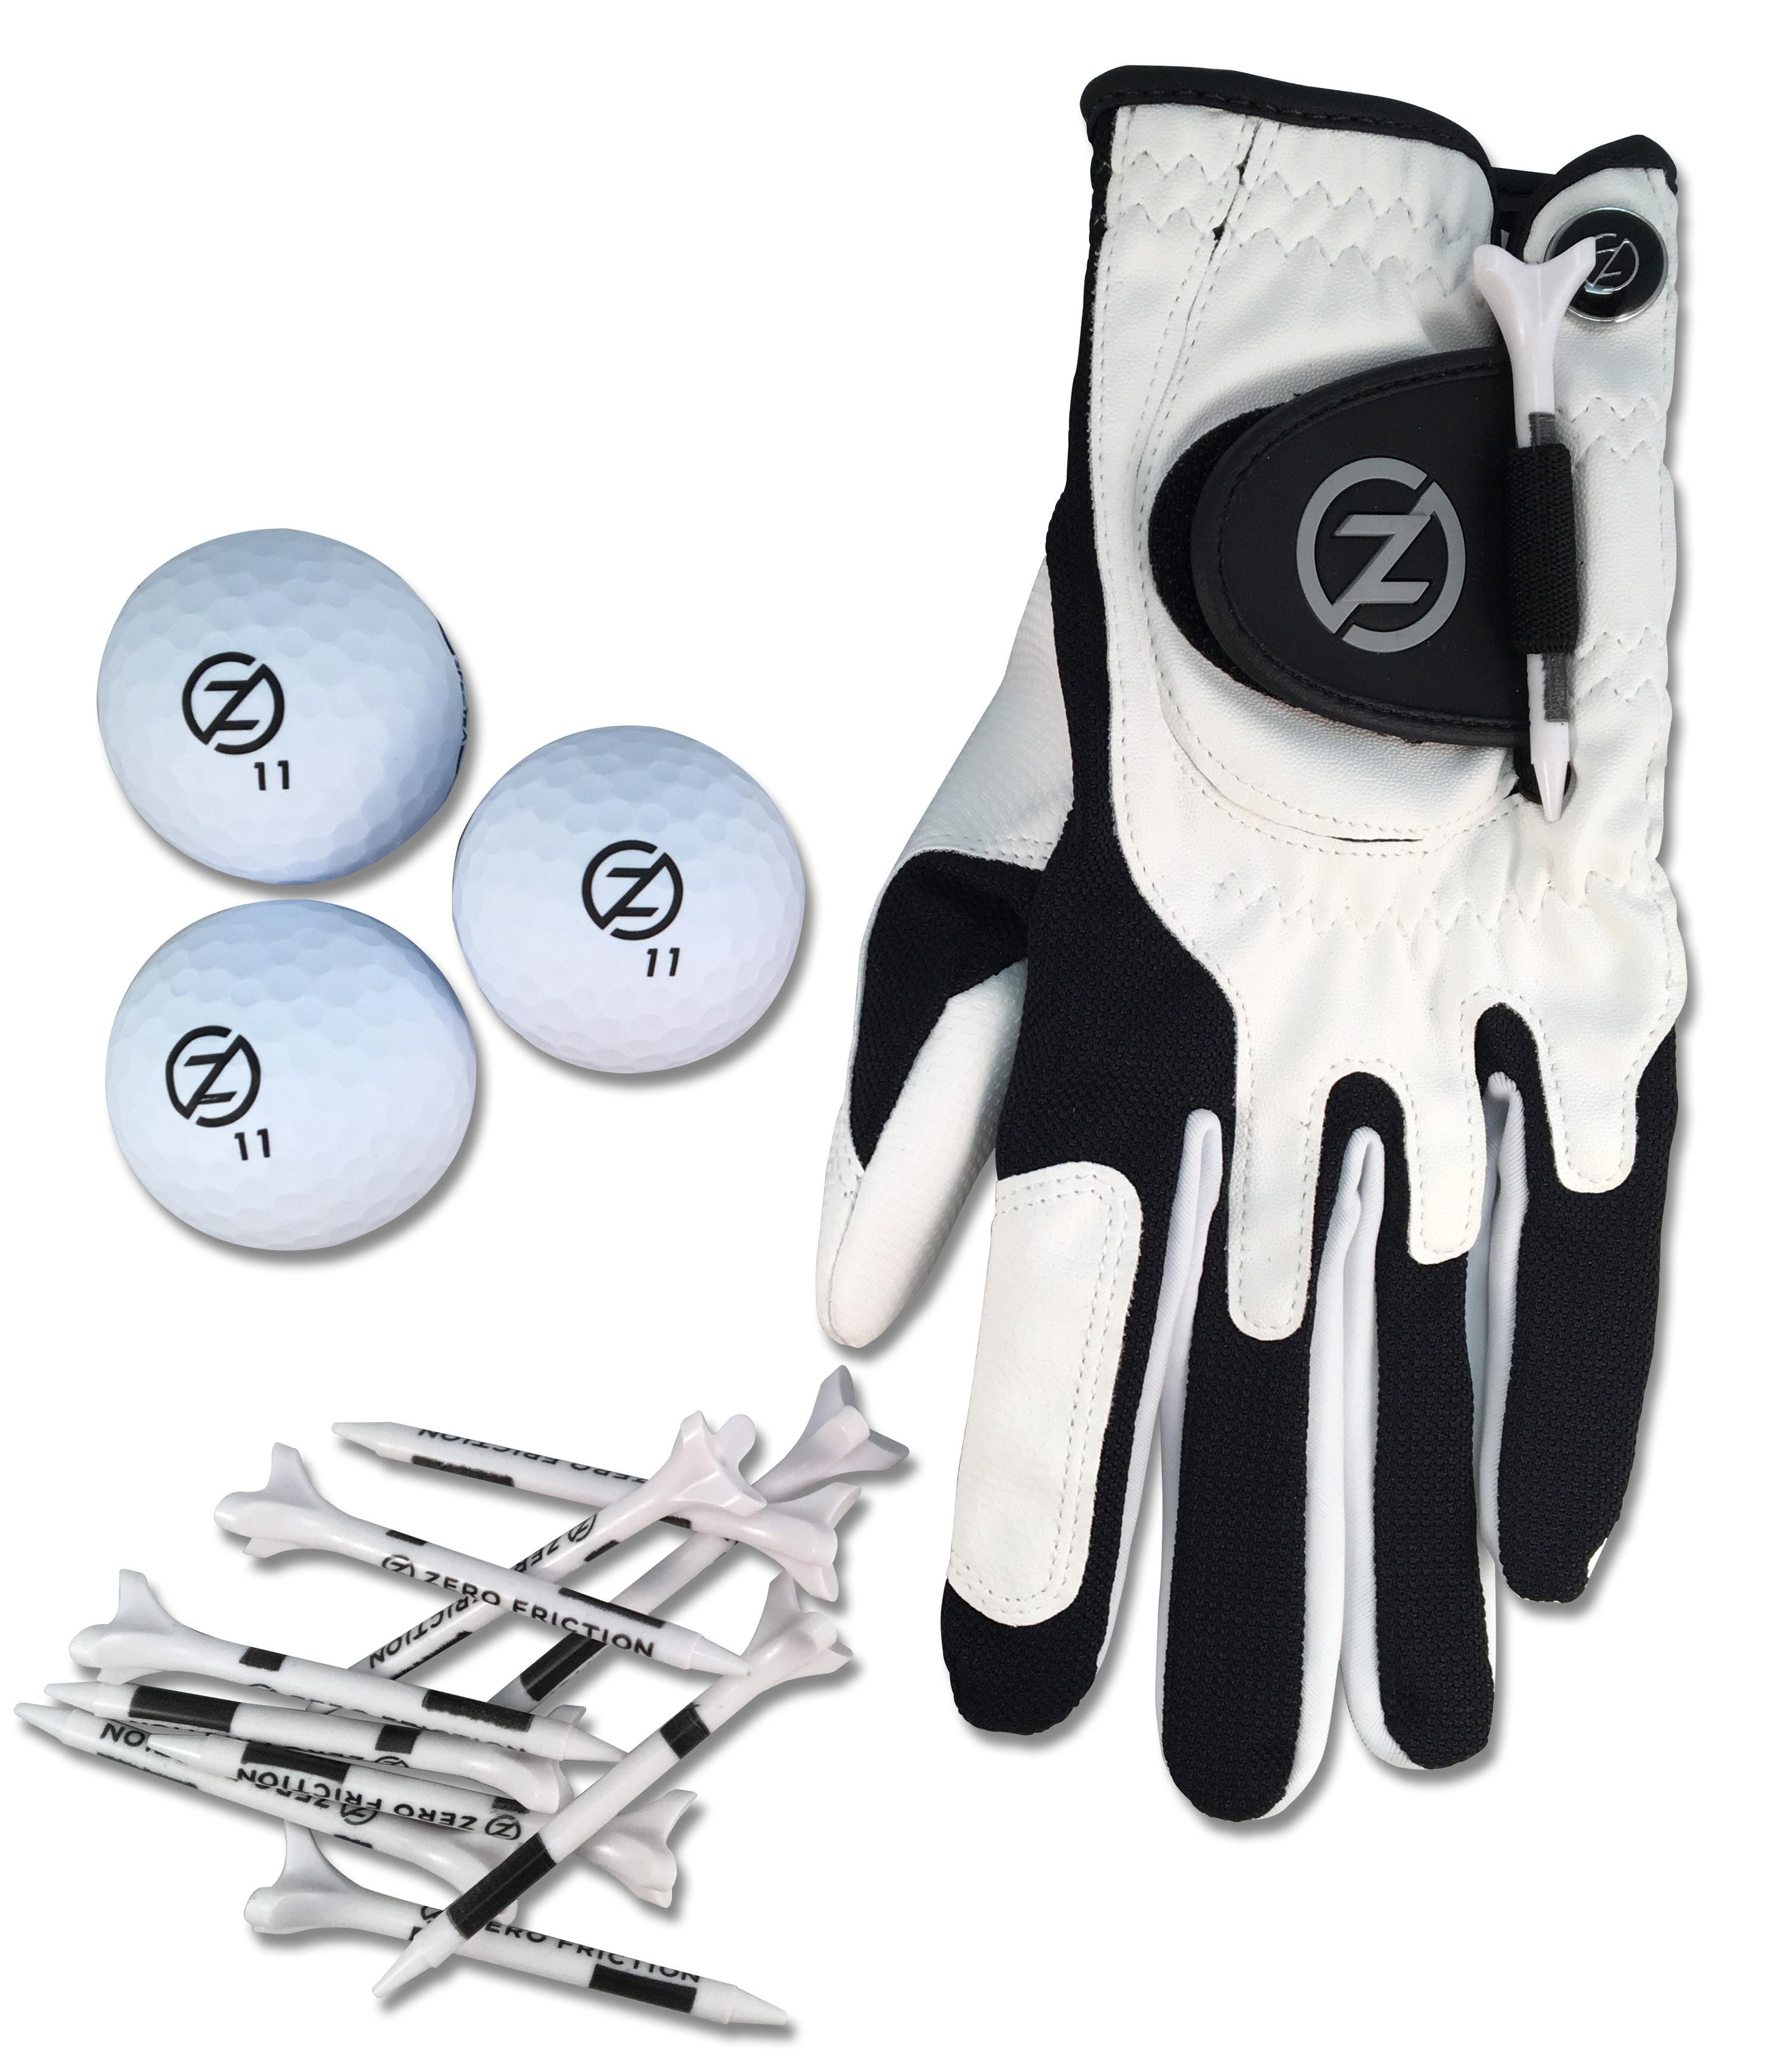 The golf balls, tees, and a white golf glove